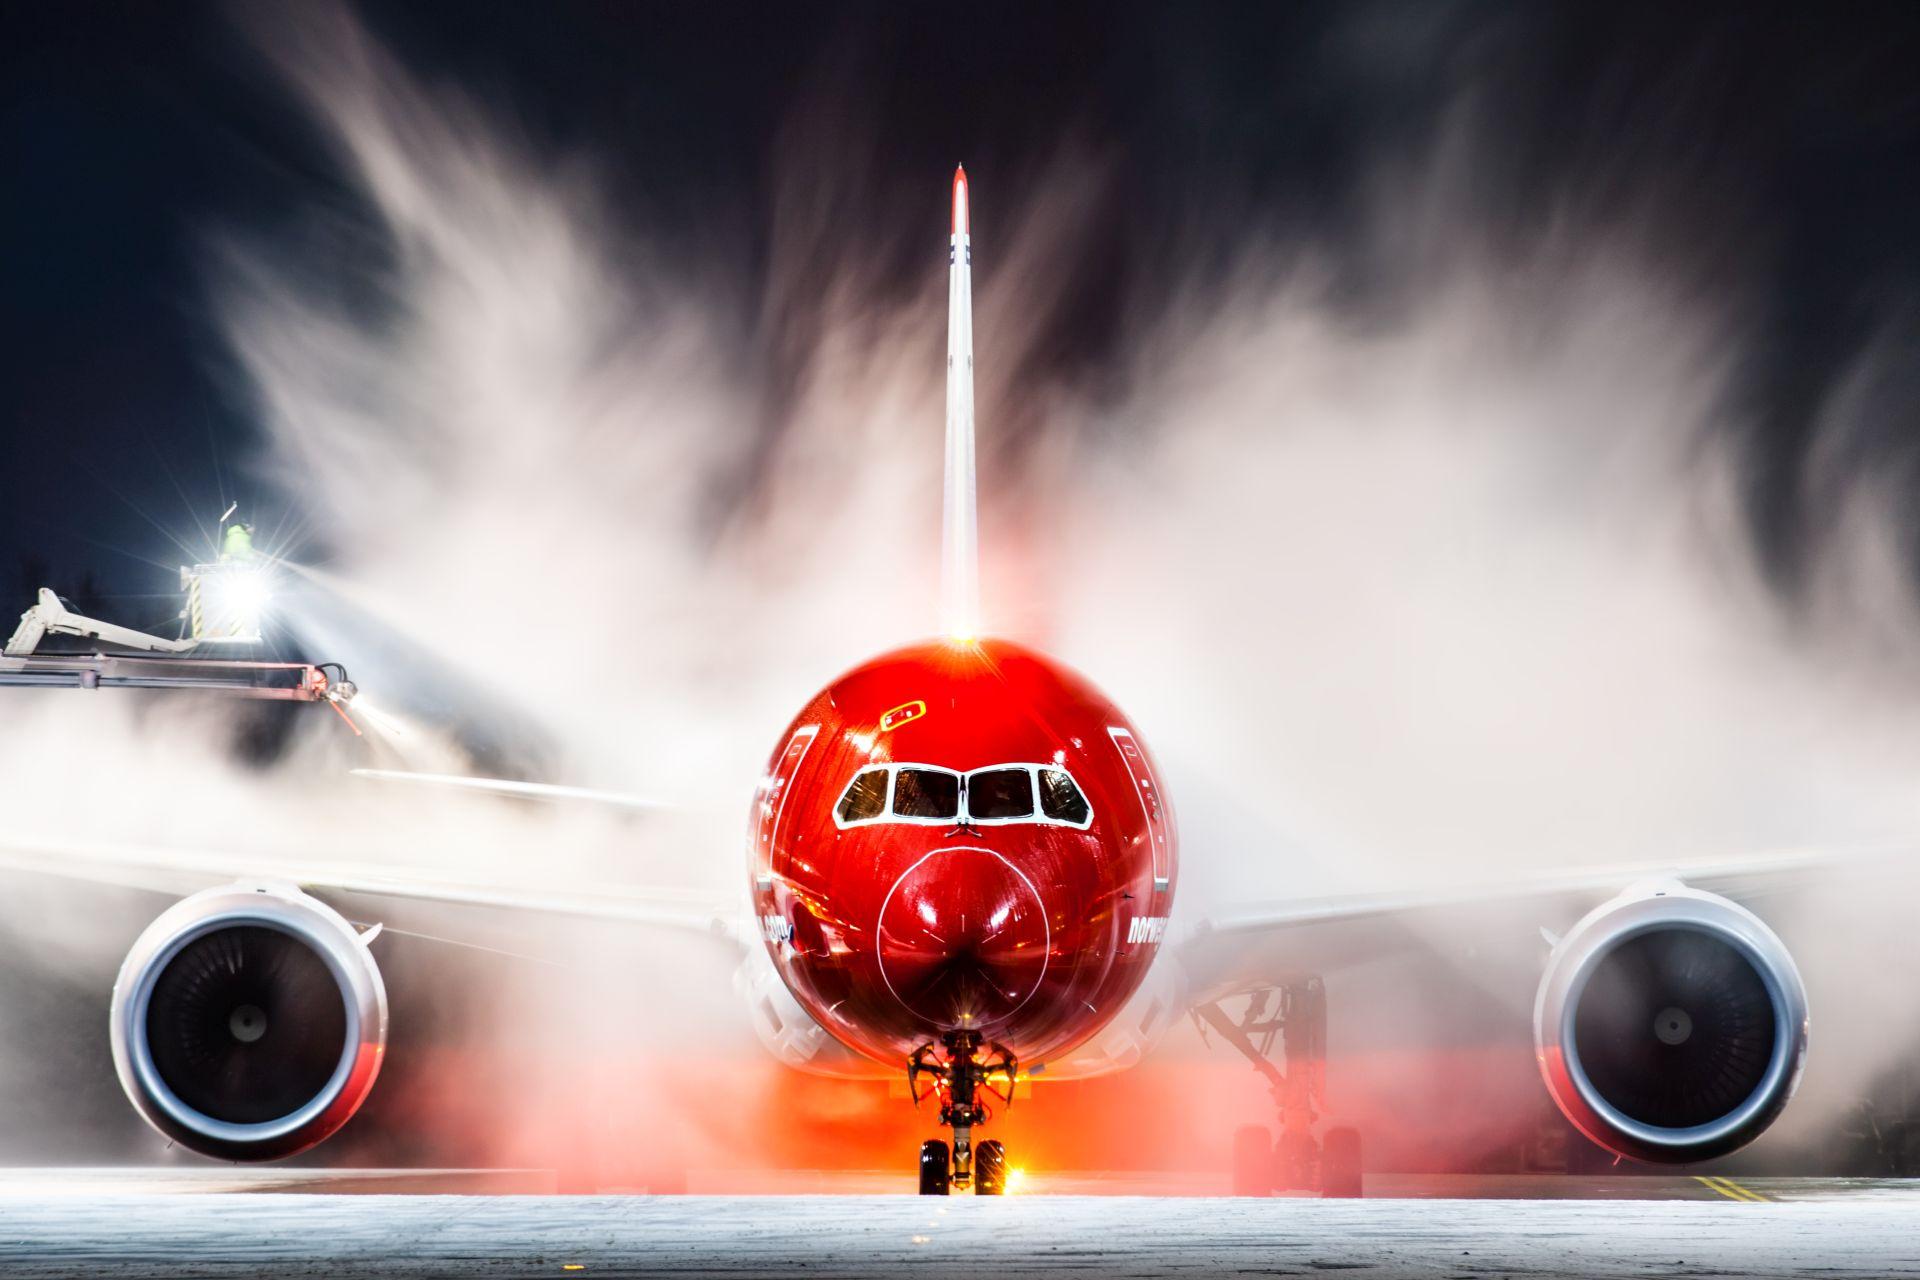 Boeing 787 společnosti Norwegian Air Shuttle. Foto: Jørgen Syversen